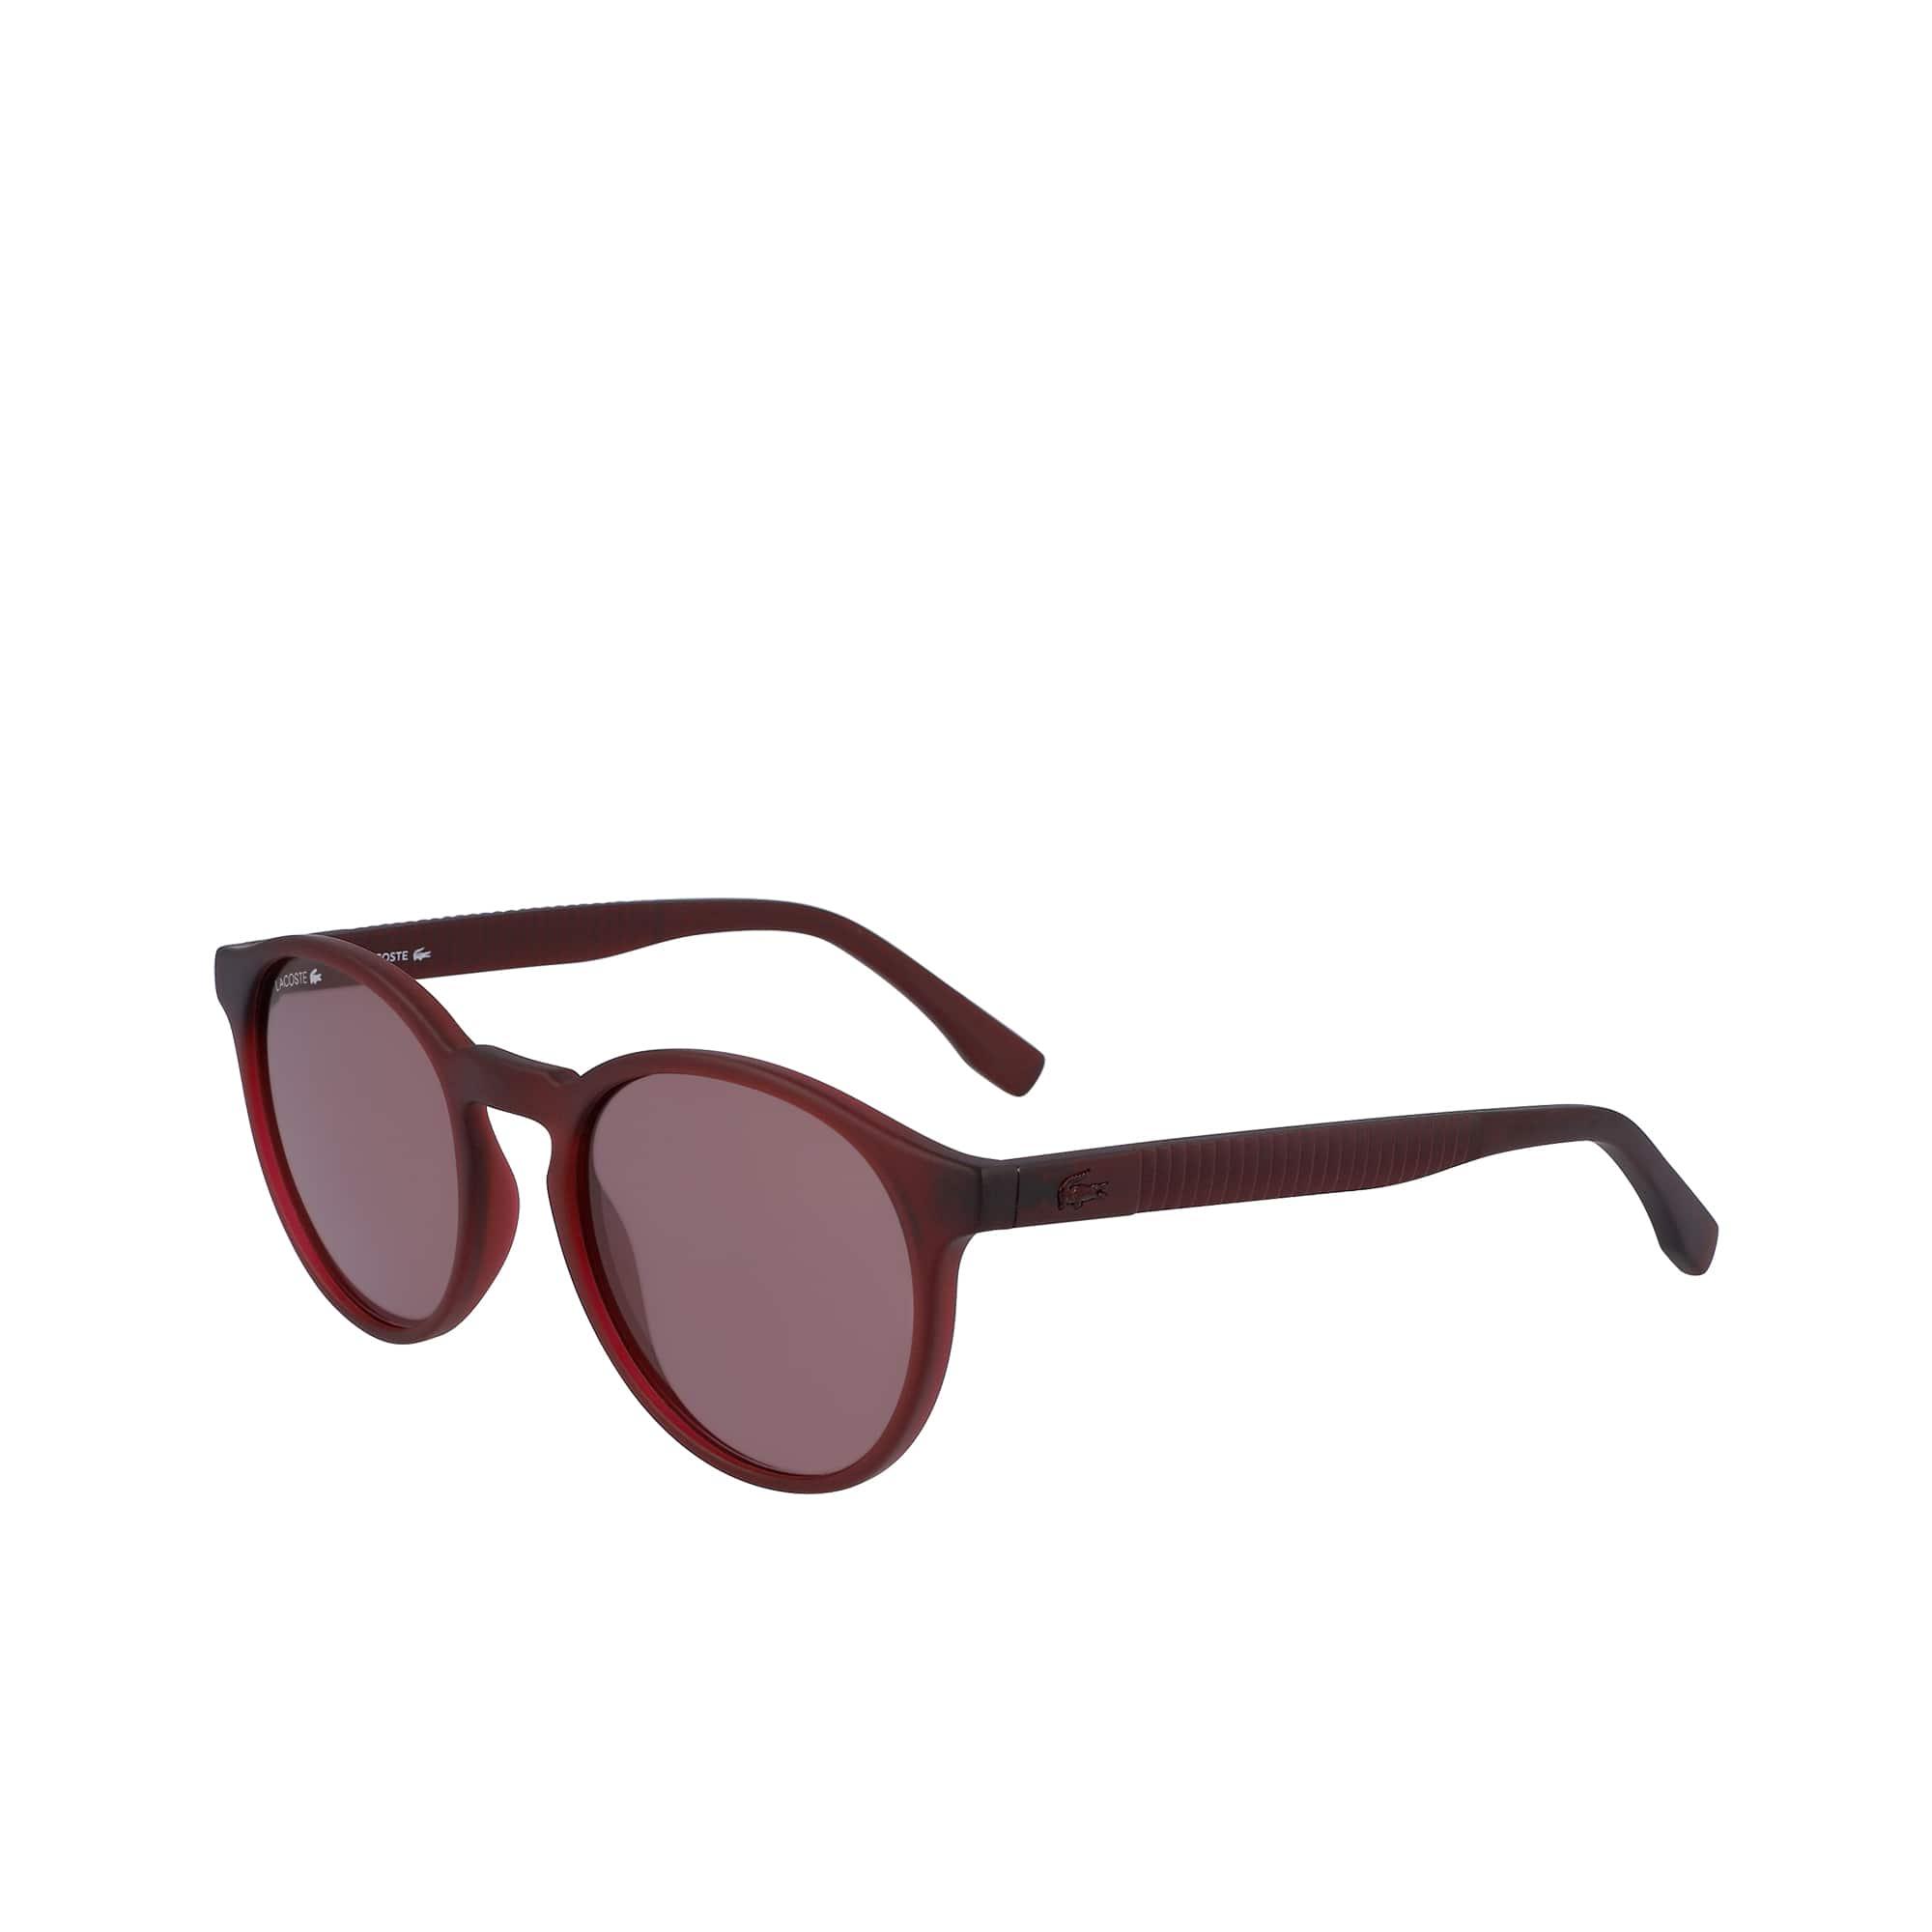 Gafas Sol De MujerComplementos Para Lacoste IbvYgymf76